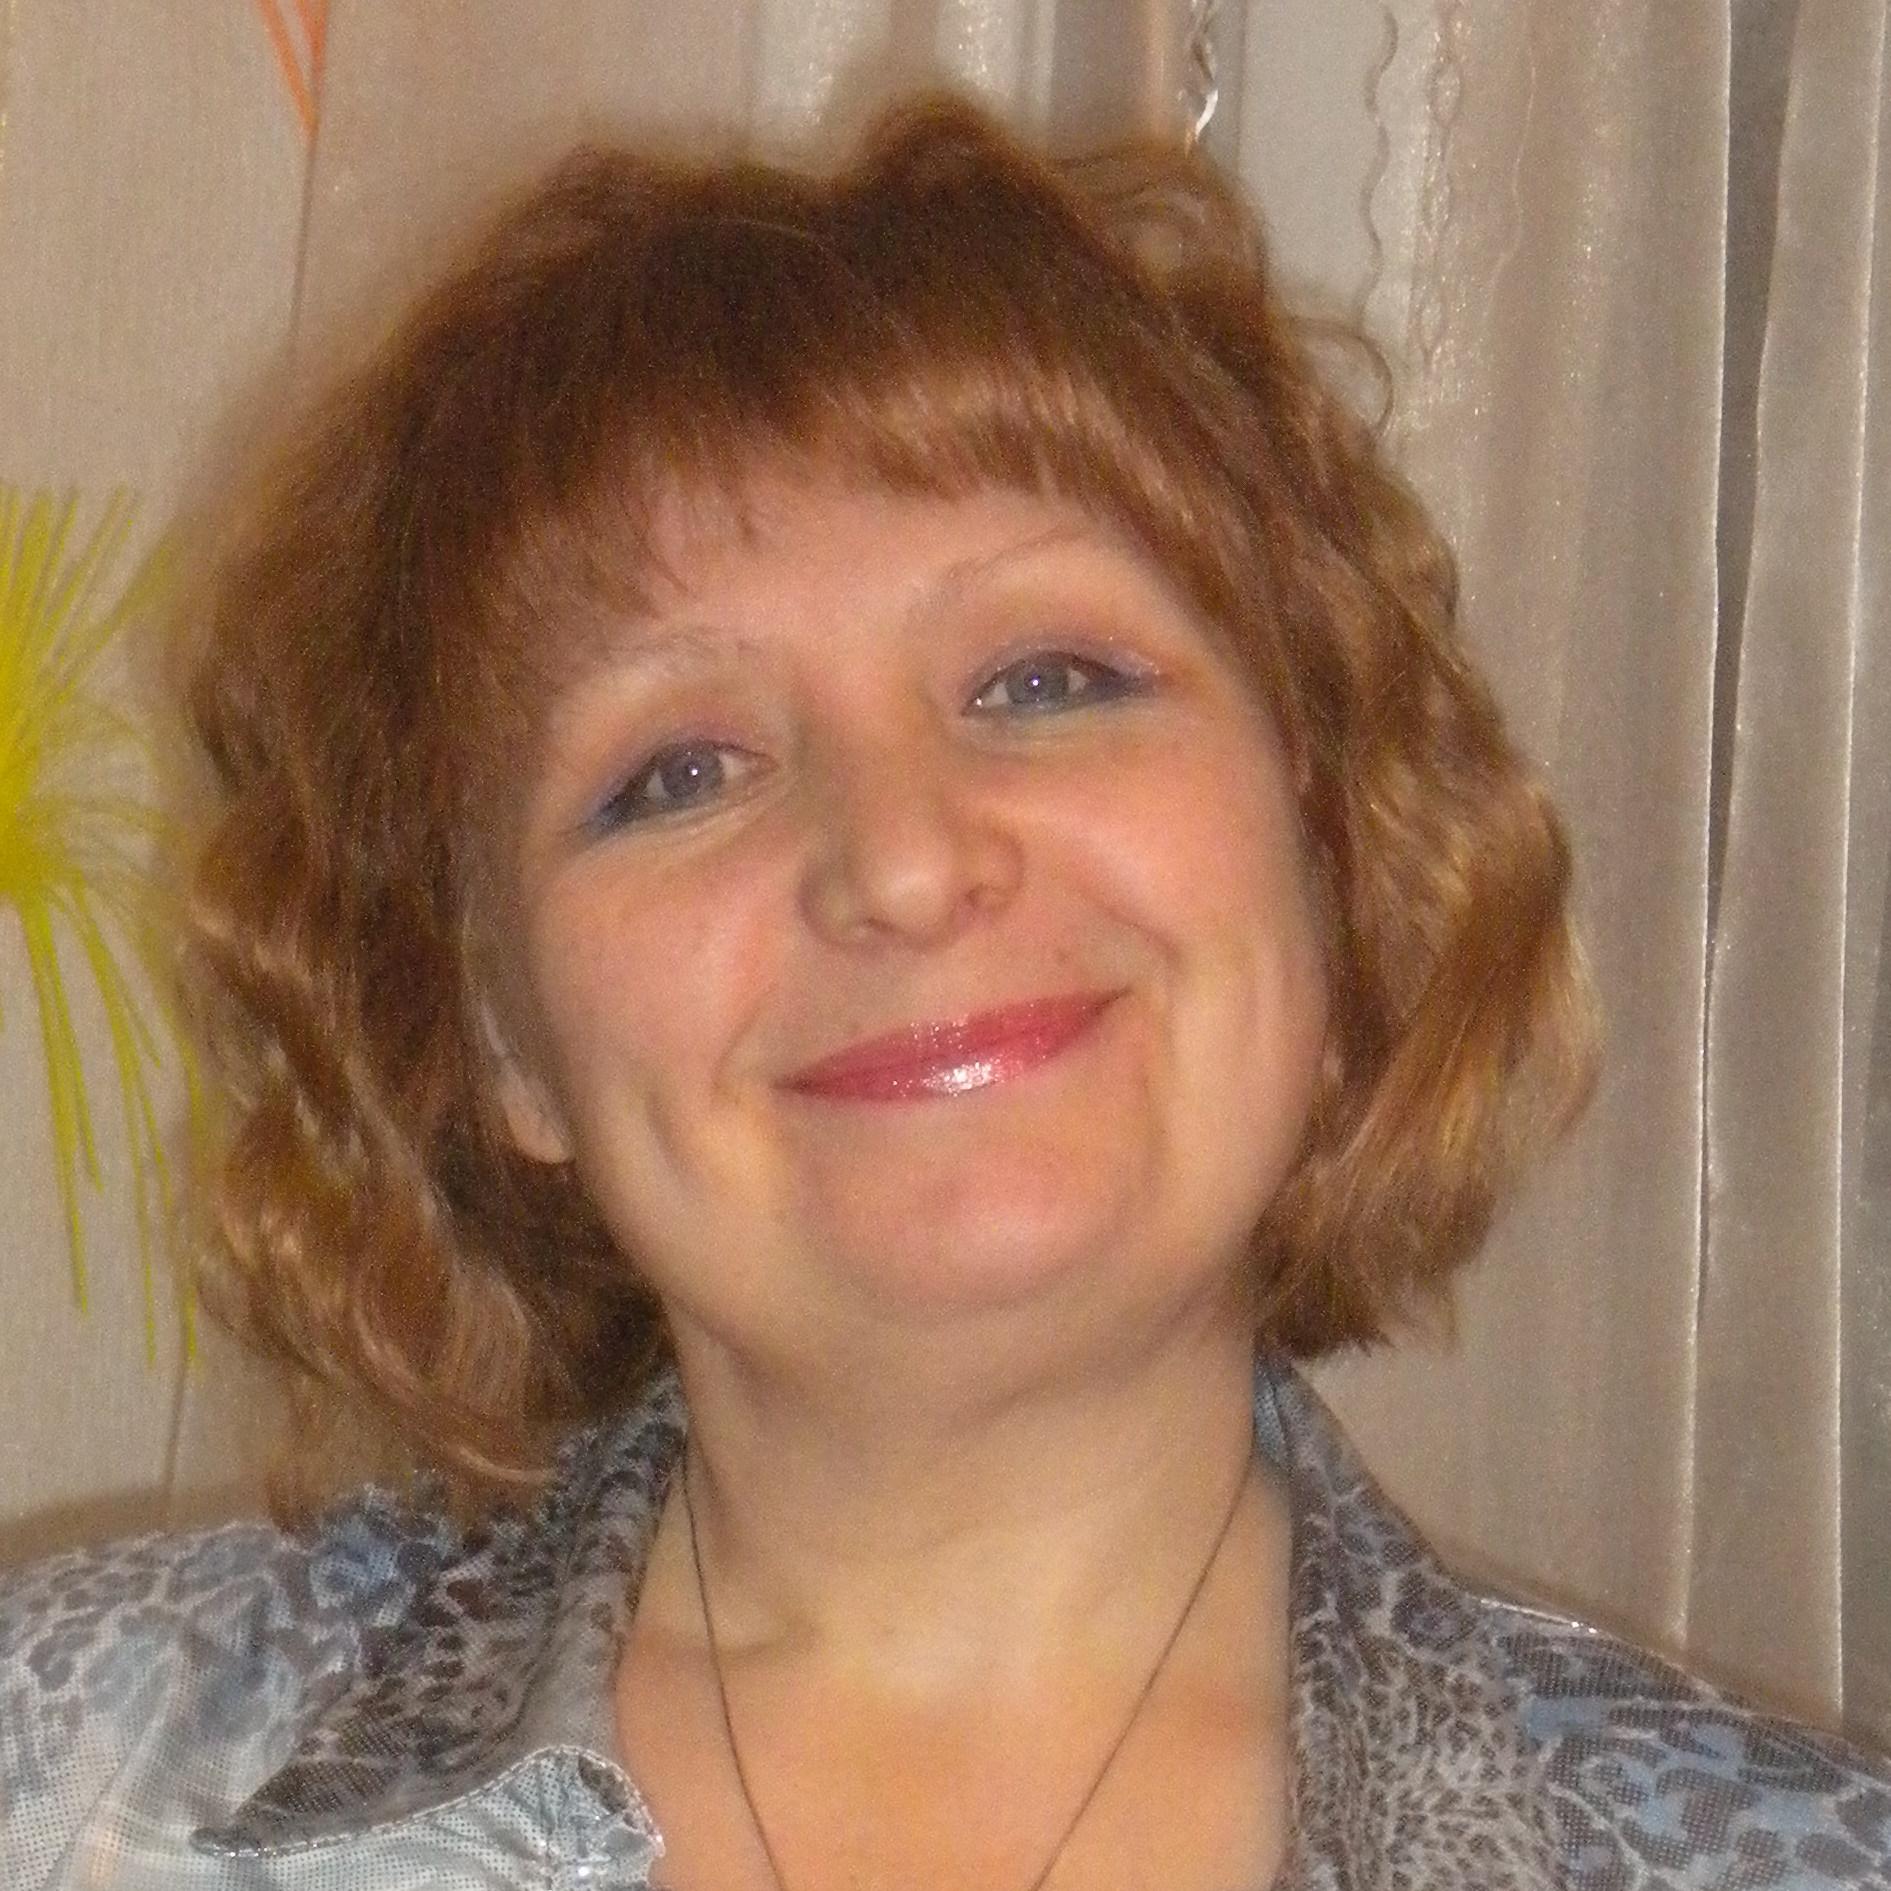 Горшкова Любовь Дмитриевна